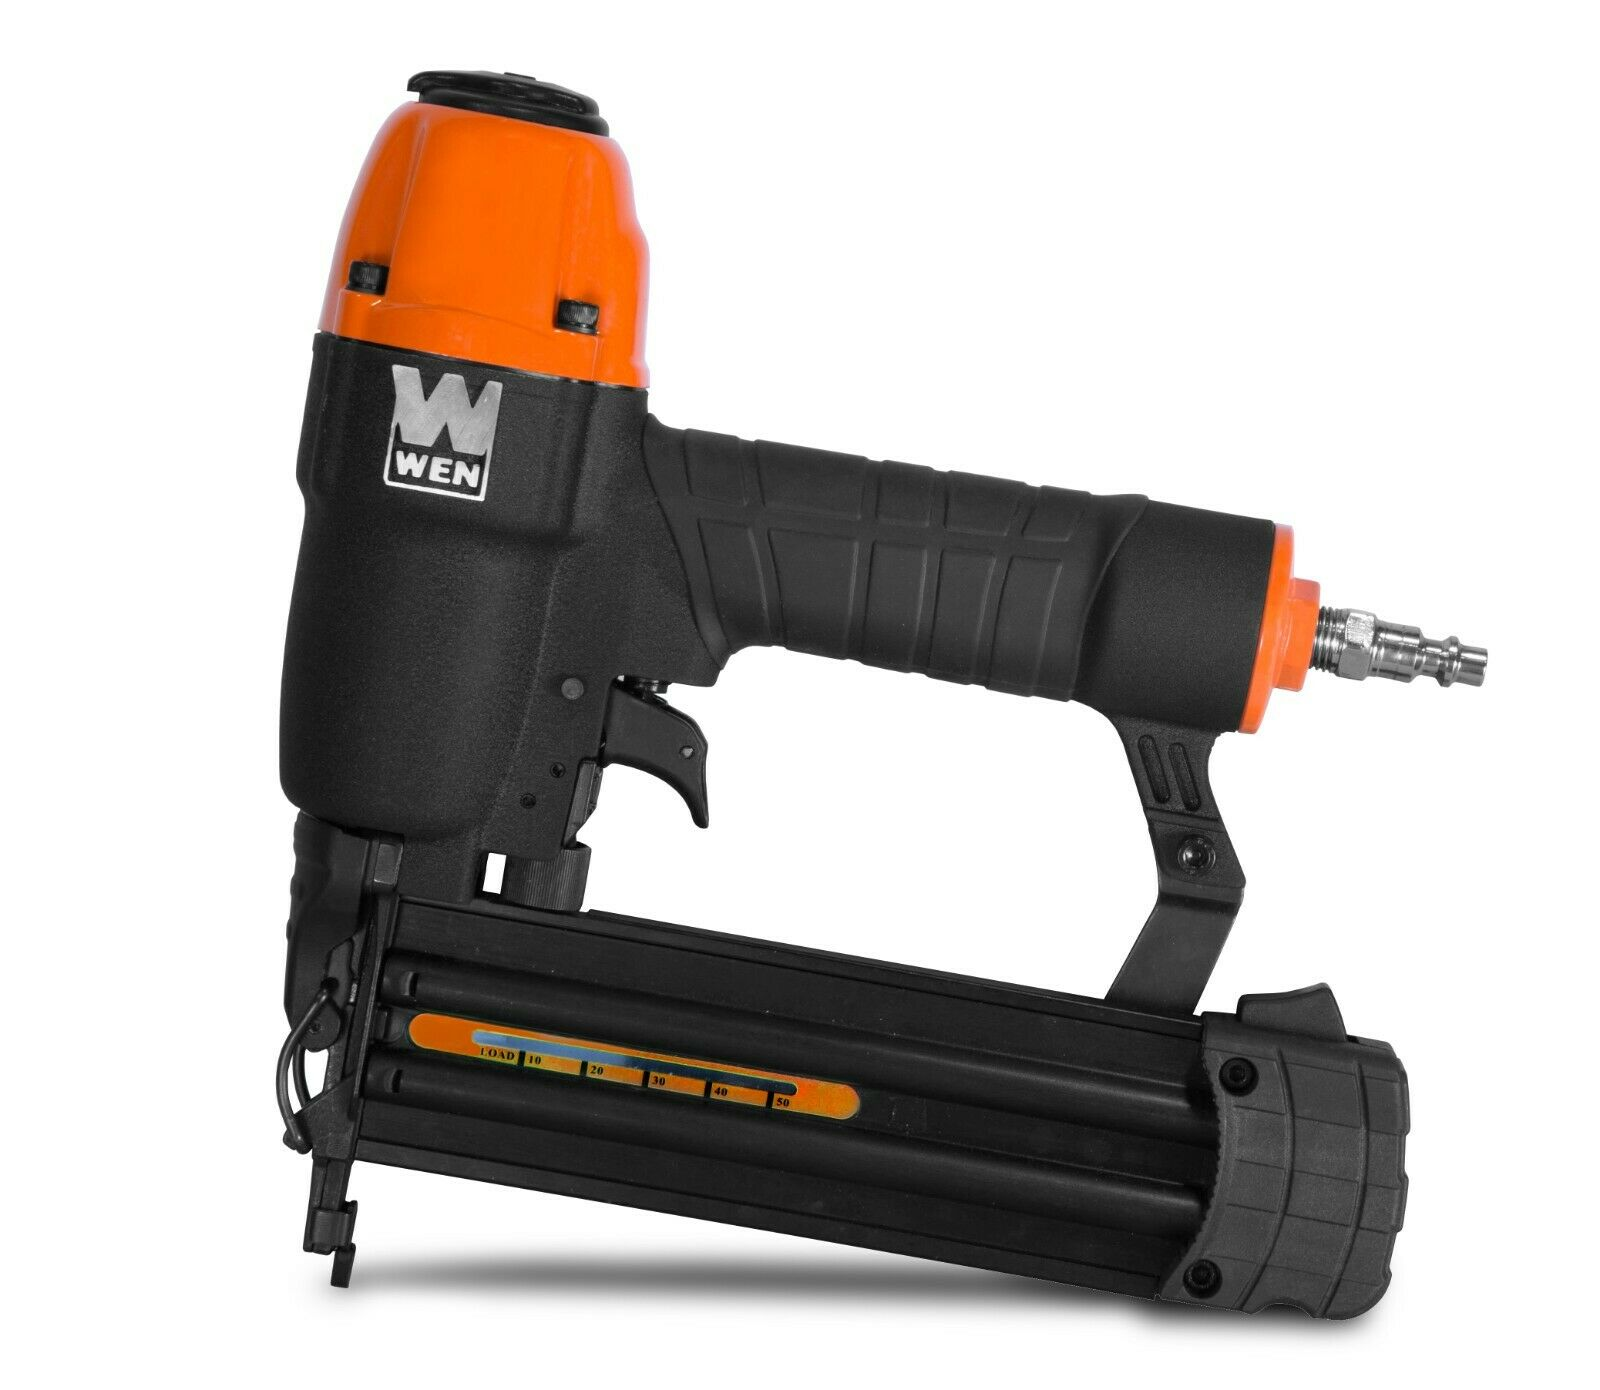 wen_products WEN 61722 18-Gauge 2-in-1 Pneumatic 2-Inch Brad Nailer and 1/4 Crown Stapler